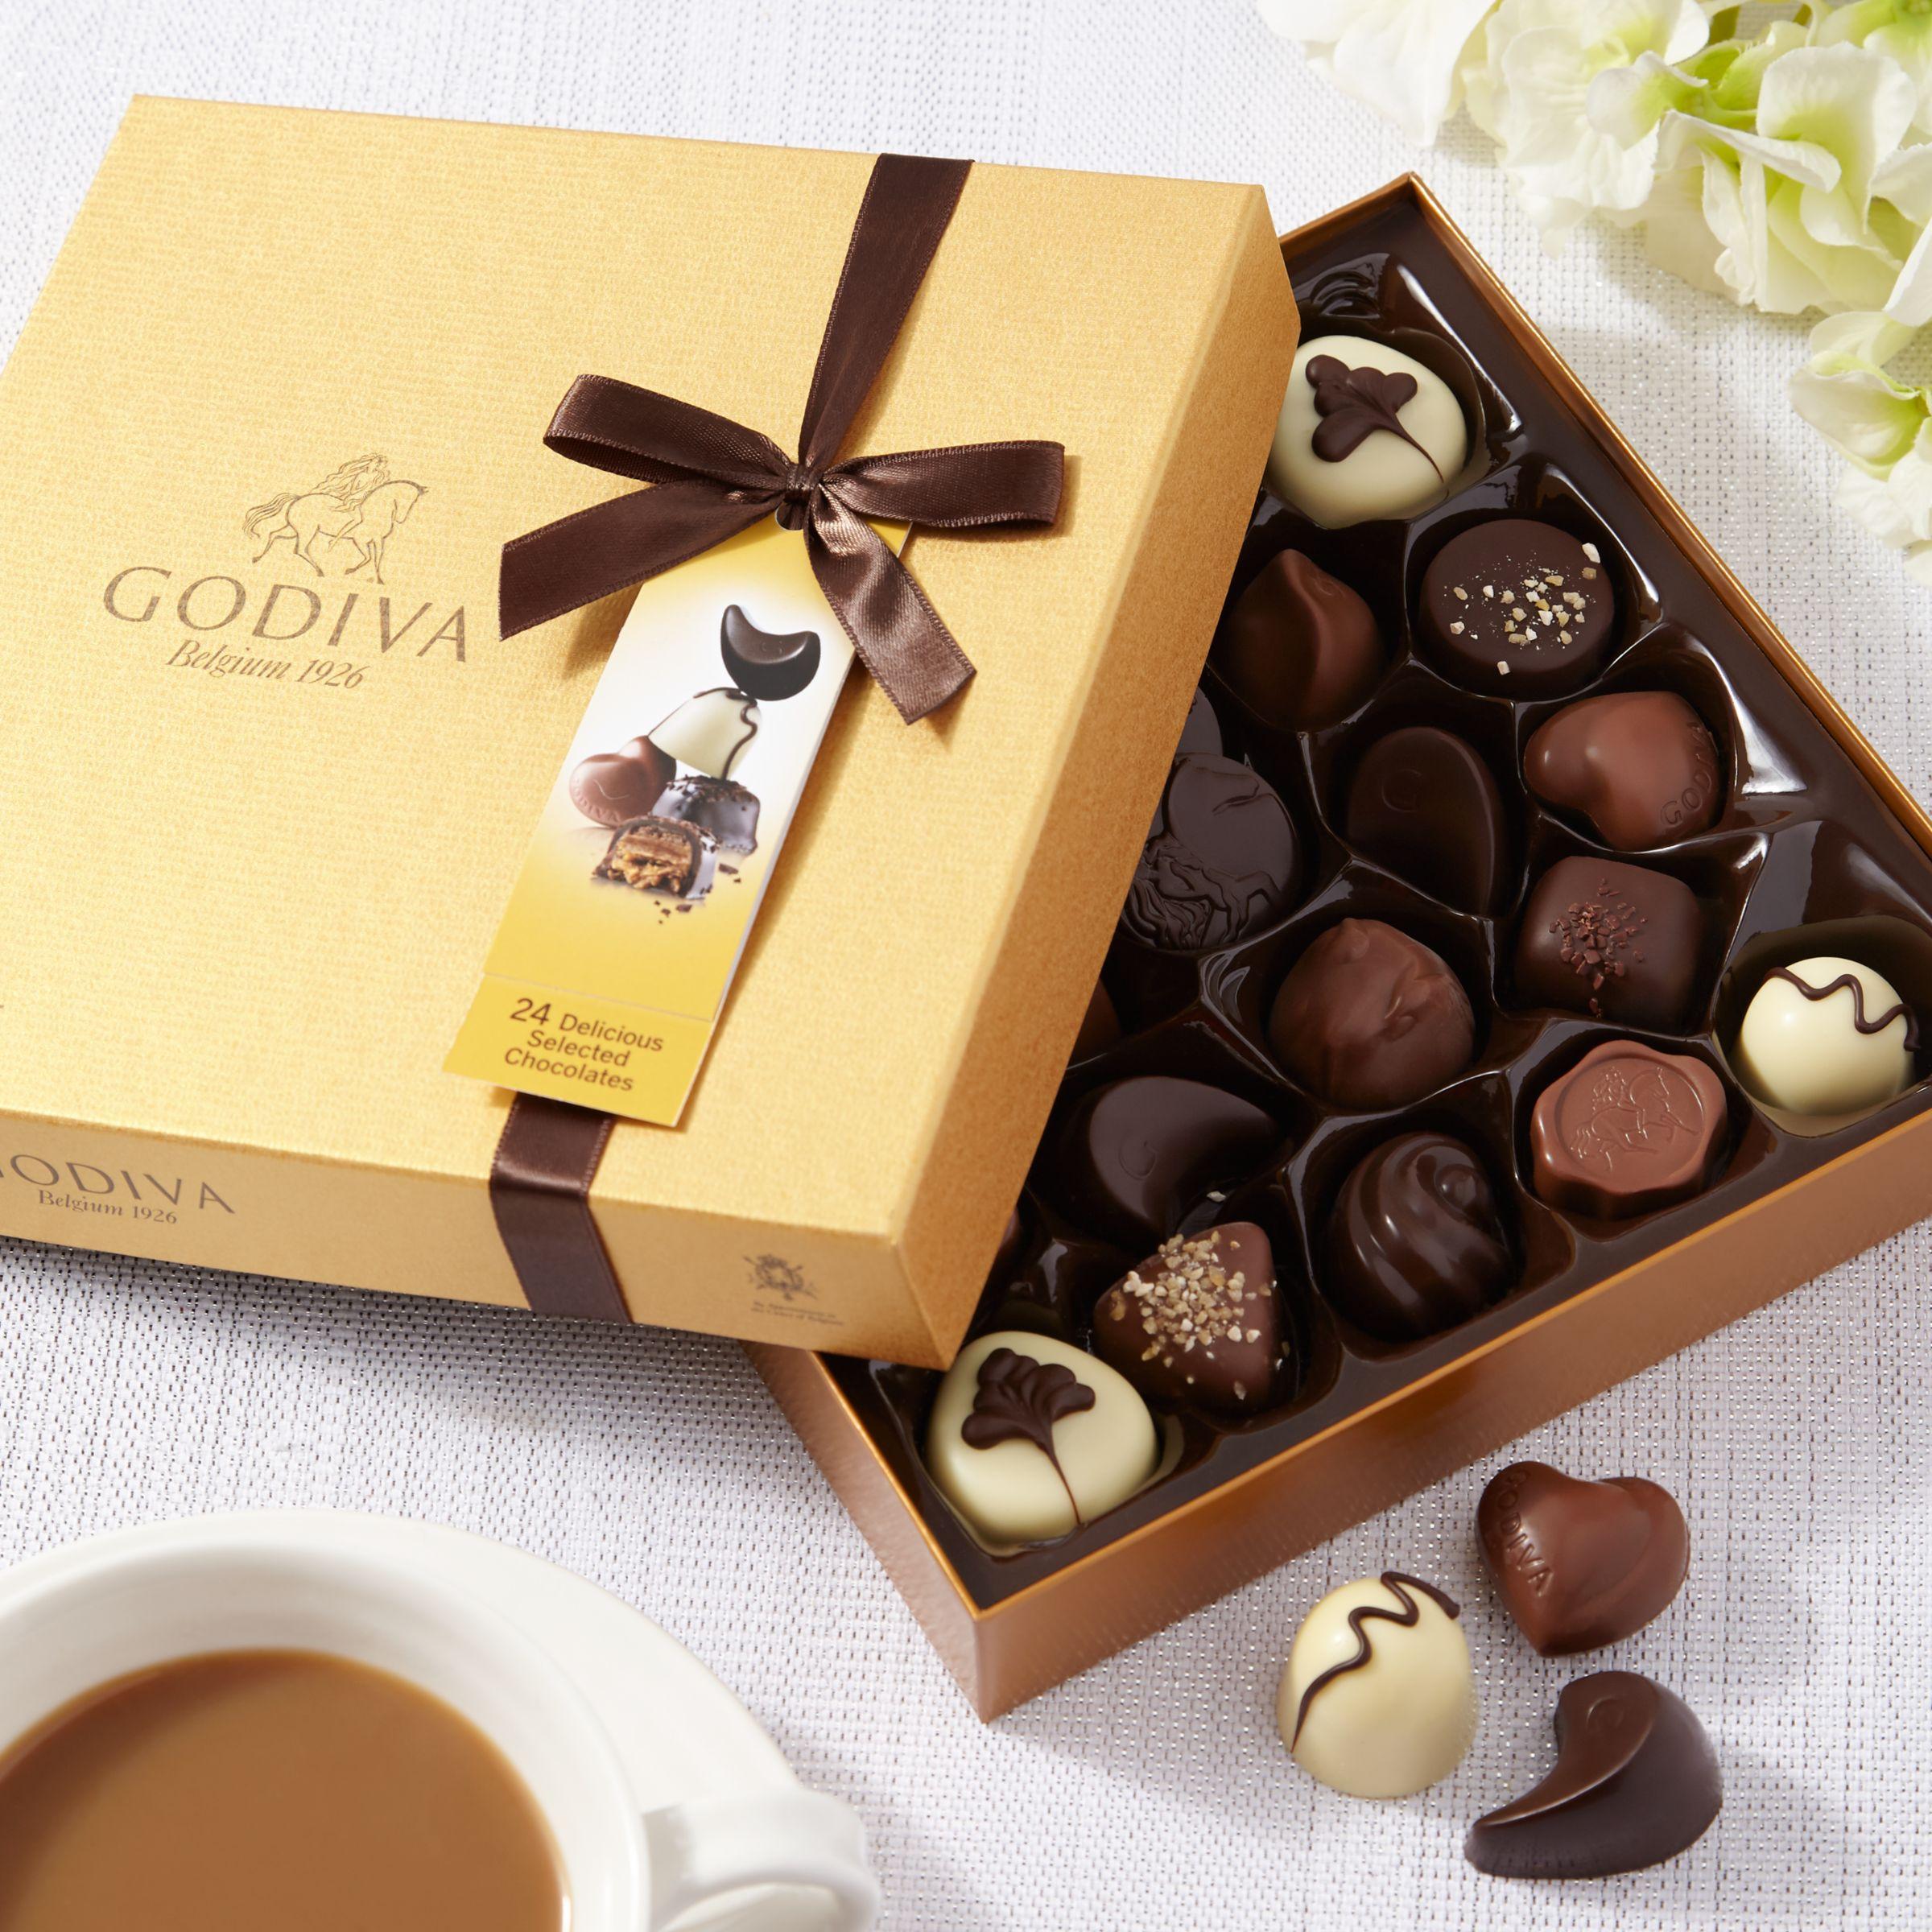 Godiva Godiva Gold Chocolate Box, 290g